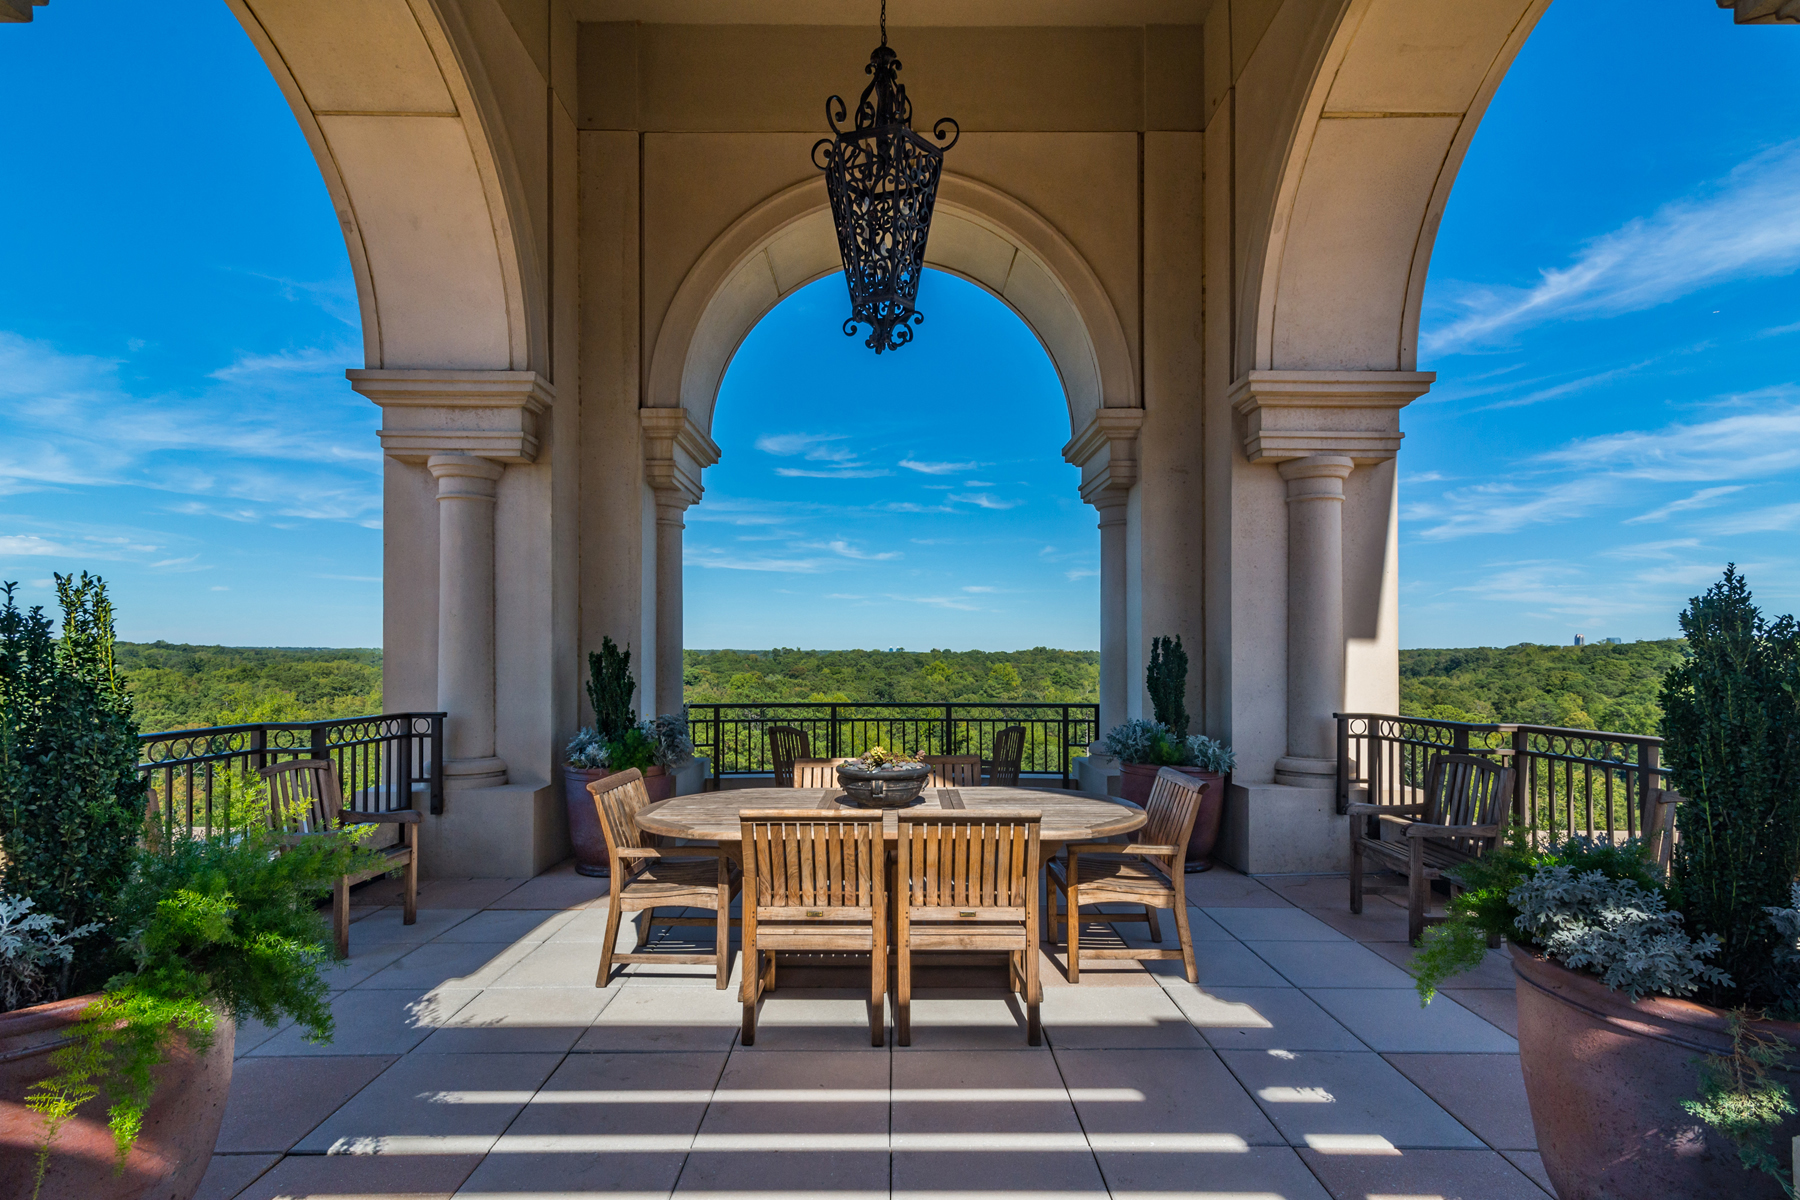 Condominium for Sale at The Beautiful Borghese In Buckhead 3286 Northside Parkway NW No. 1104 Atlanta, Georgia 30327 United States